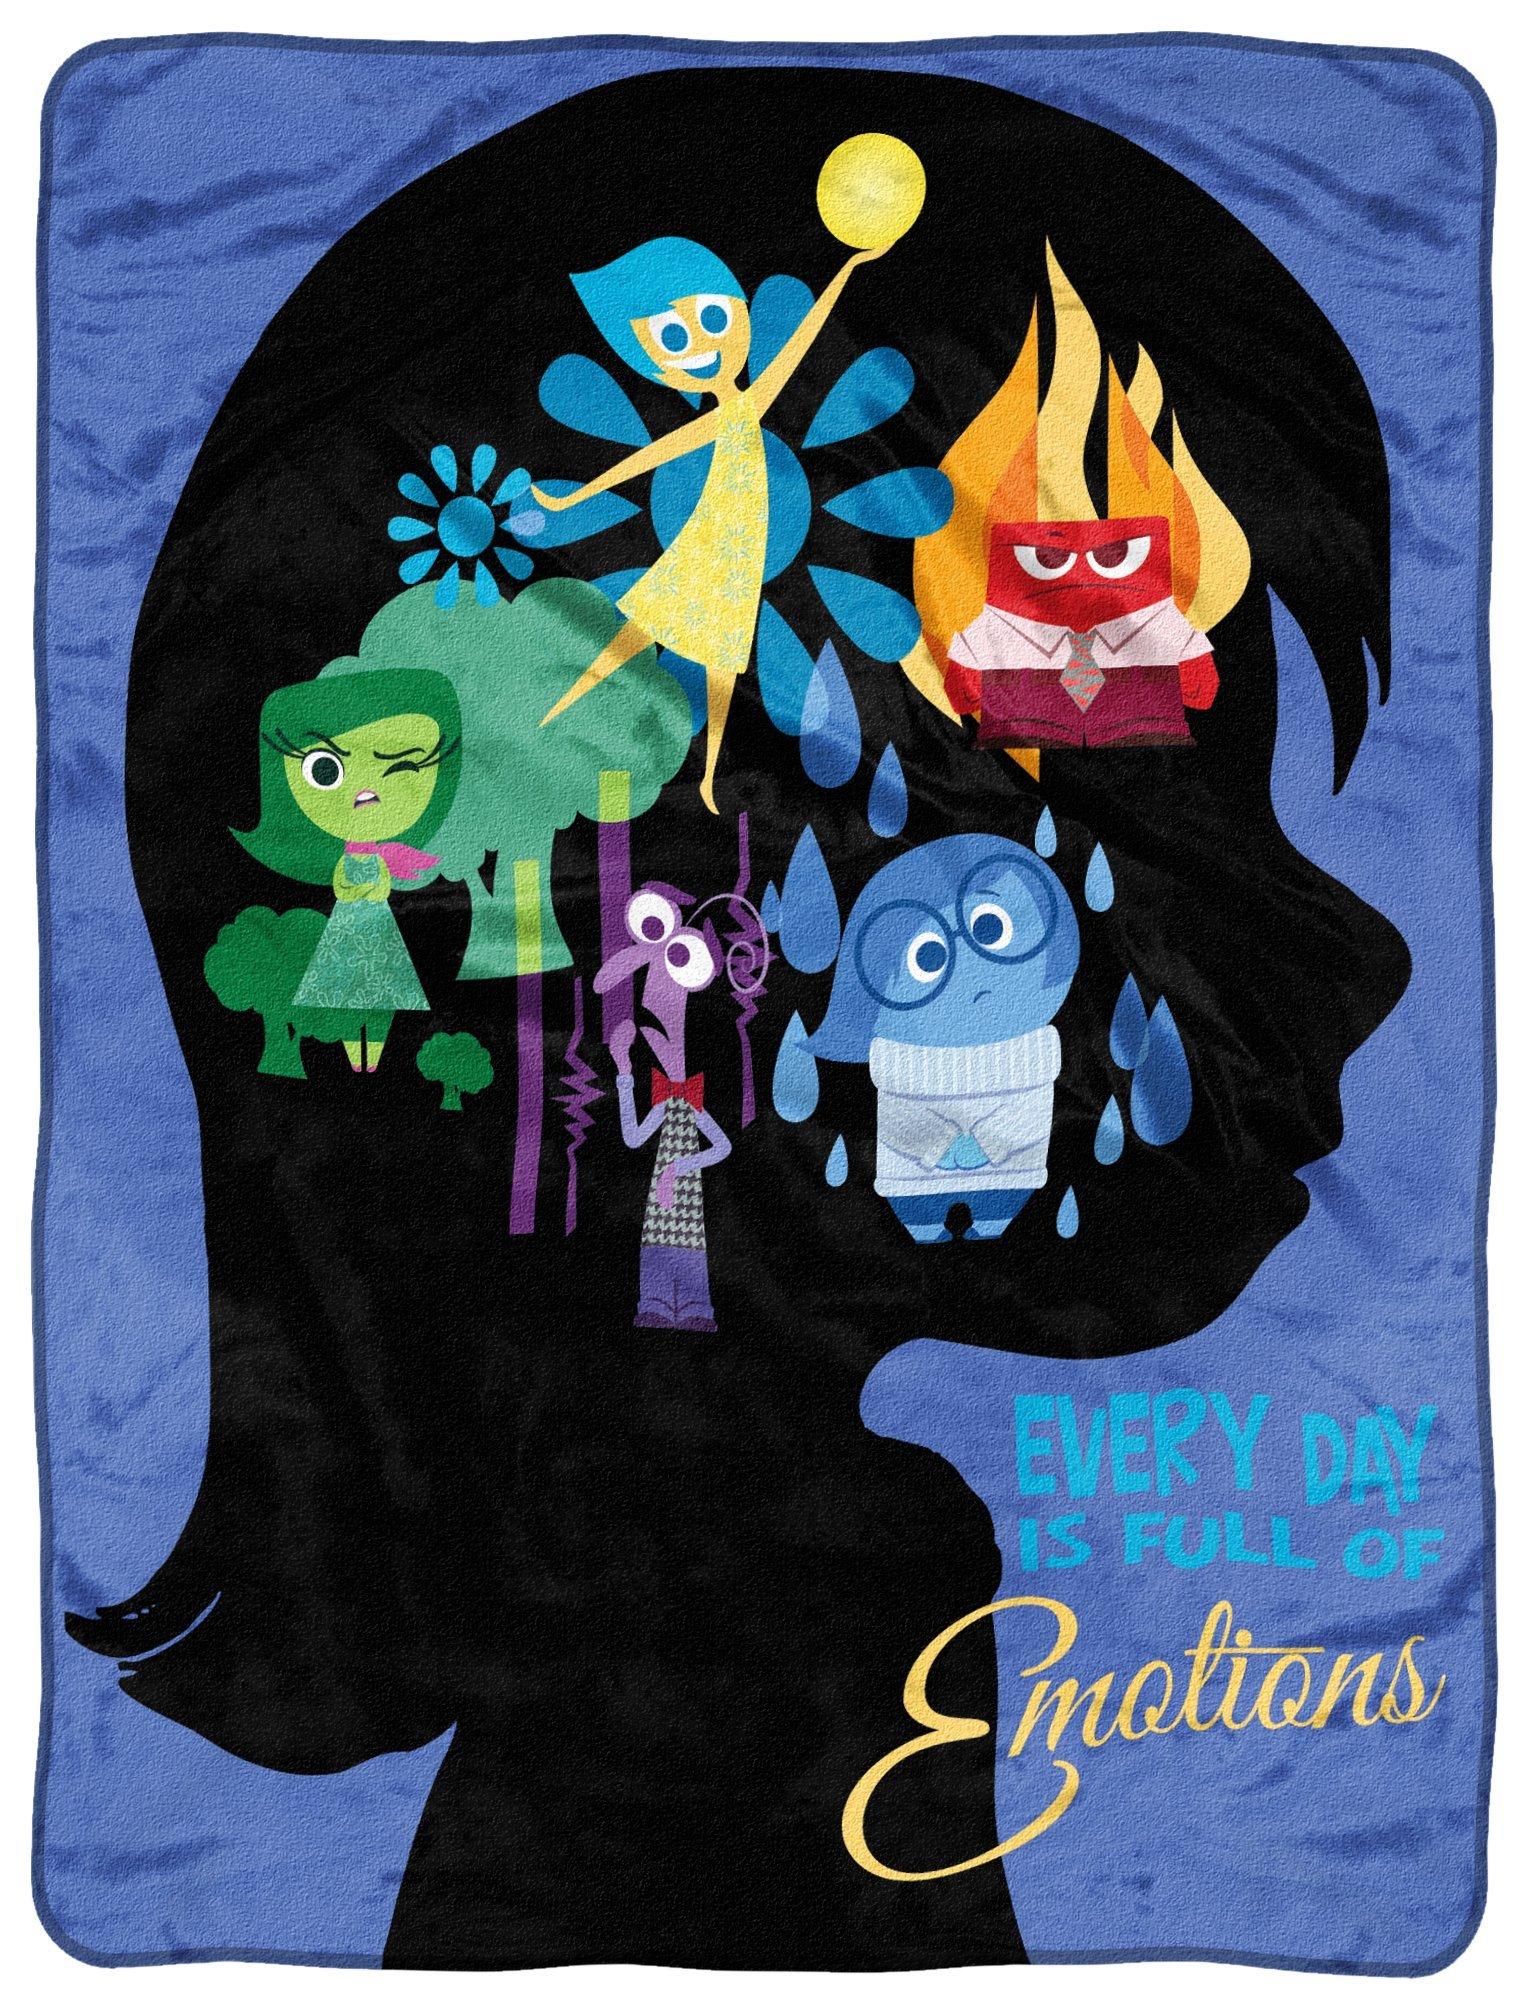 Disney-Pixar's Inside Out, ''Everyday Poster'' Micro Raschel Throw Blanket, 46'' x 60'', Multi Color